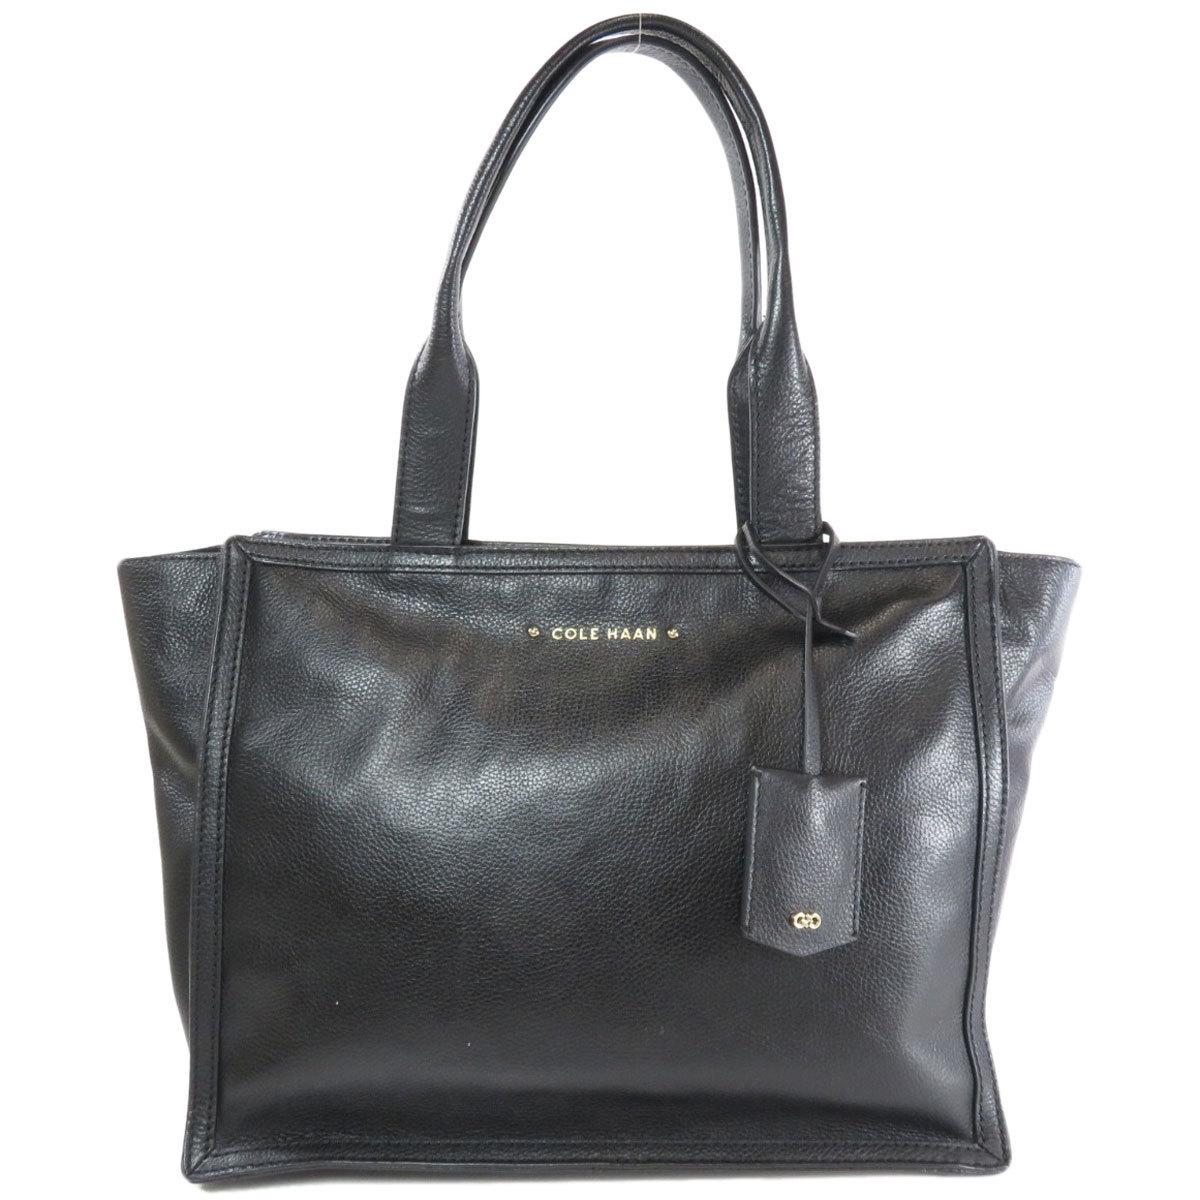 Cole Haan Logo Motif Tote Bag Leather Ladies